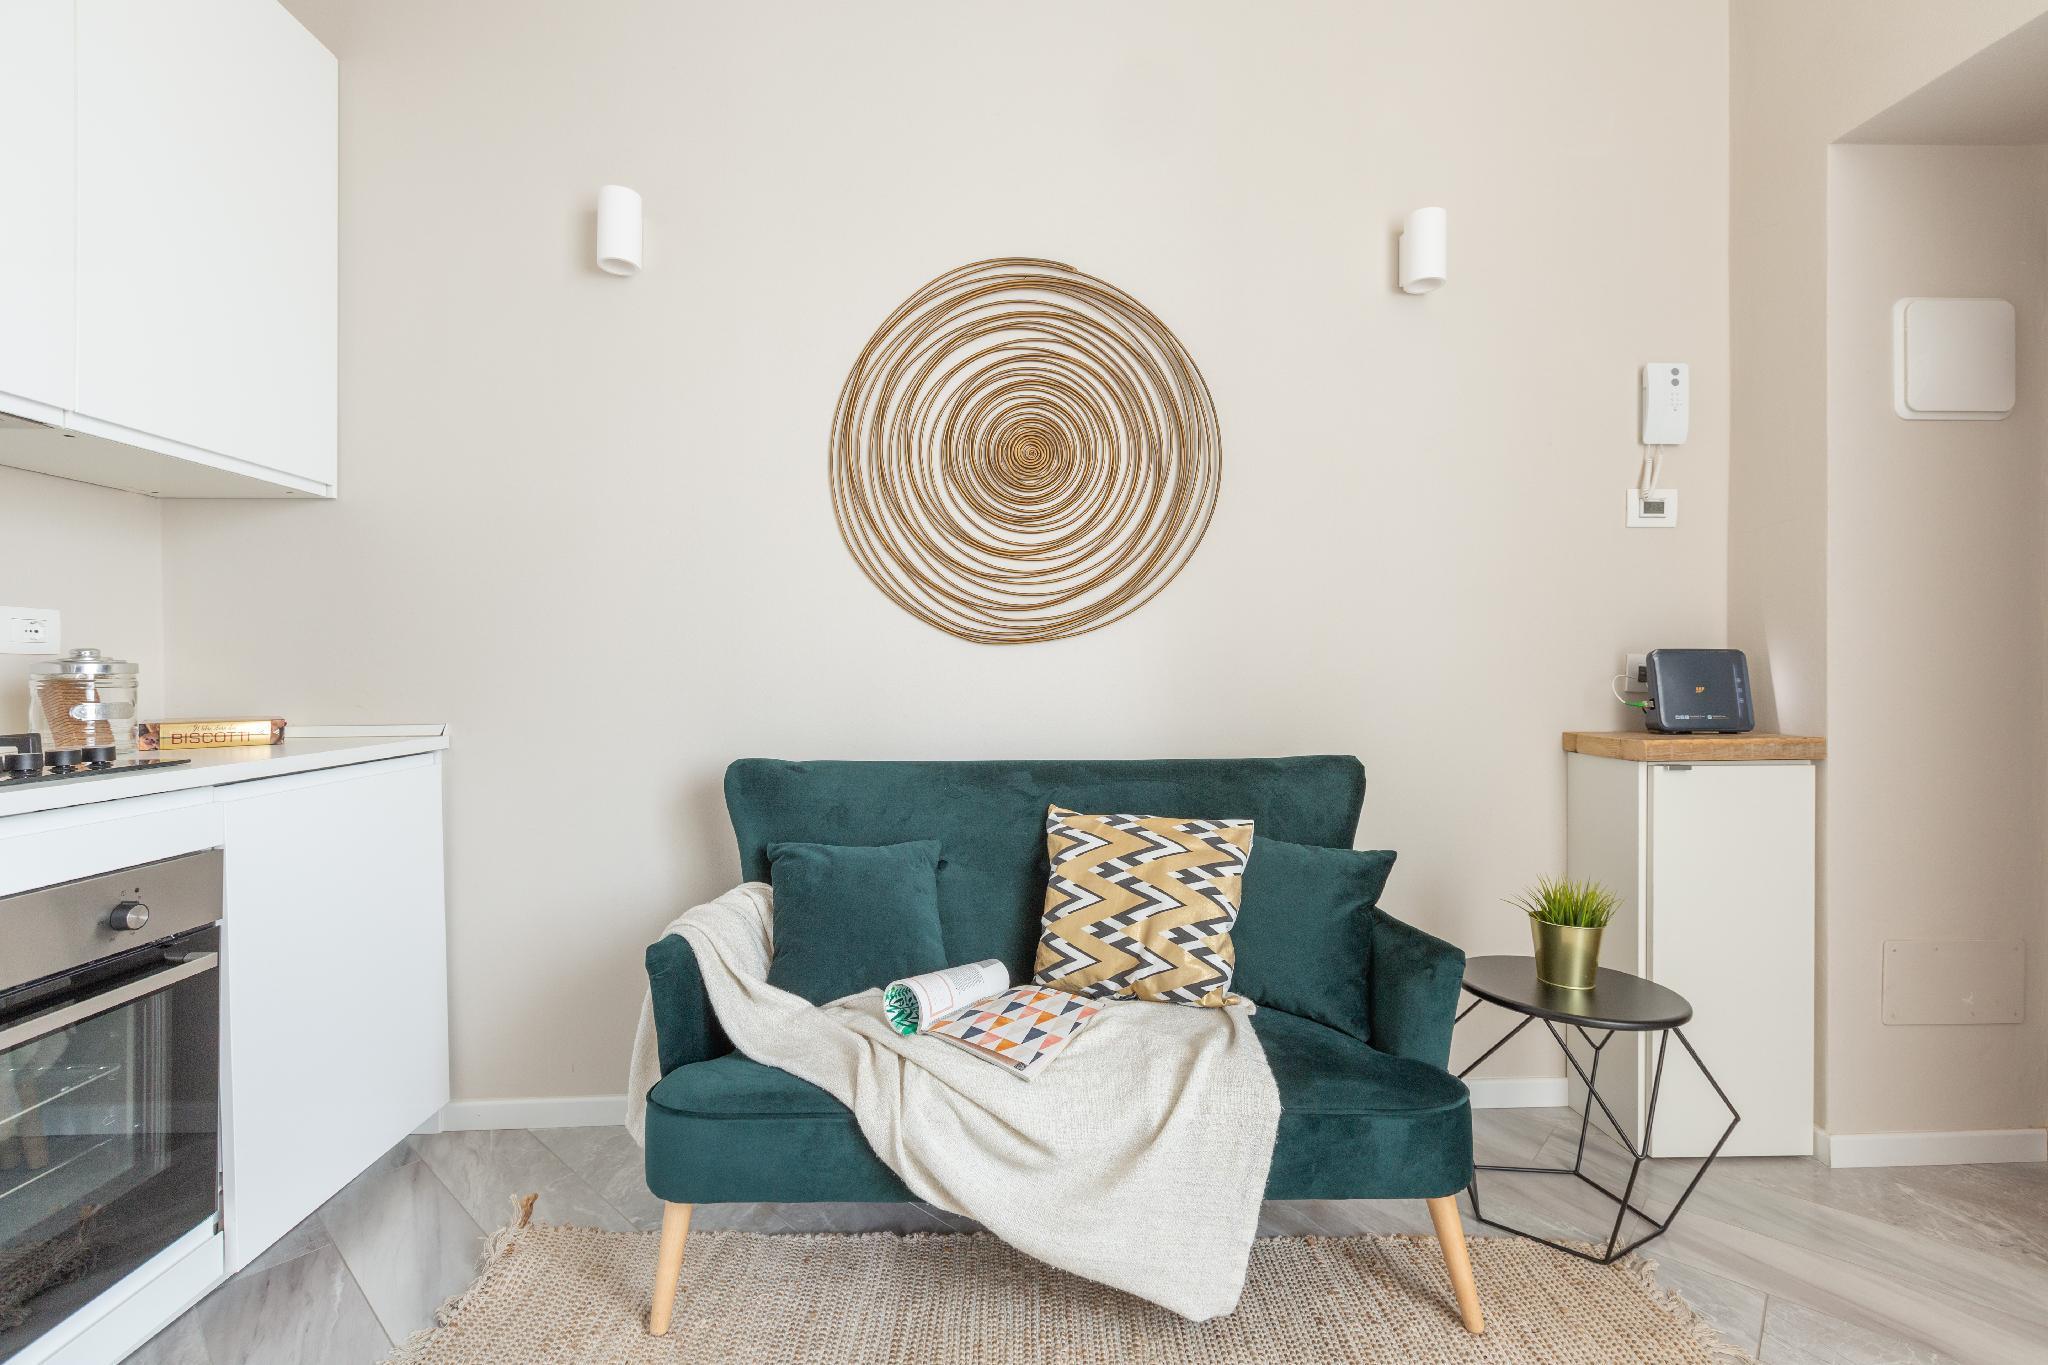 Entire Studio - Hotel room style